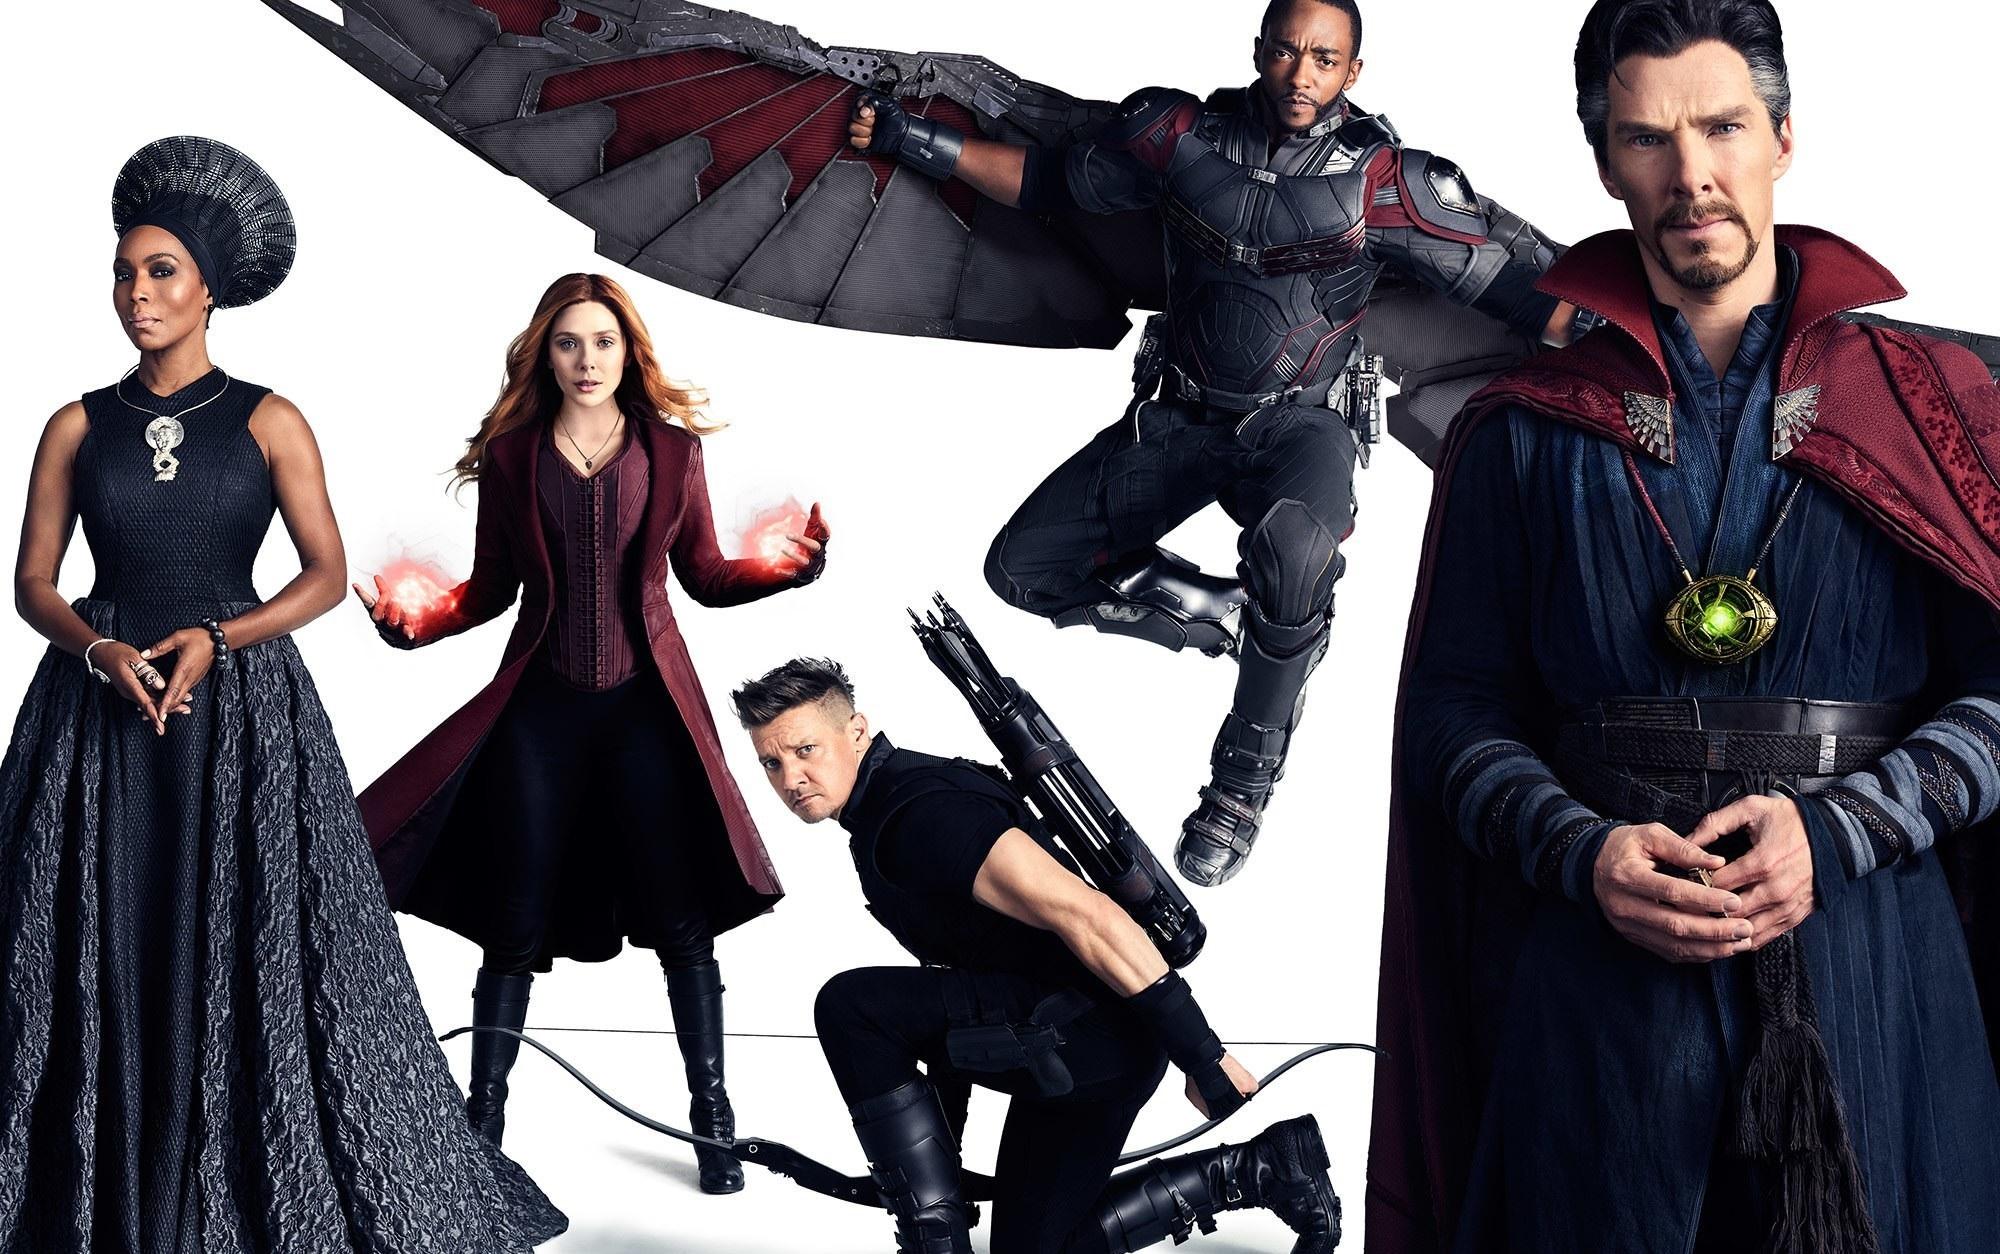 Amazing Vision Wanda Infinity War Wallpaper - avengers-infinity-war-doctor-strange-falcon-hawkeye-scarlet-witch-1y  You Should Have_964115 .jpg